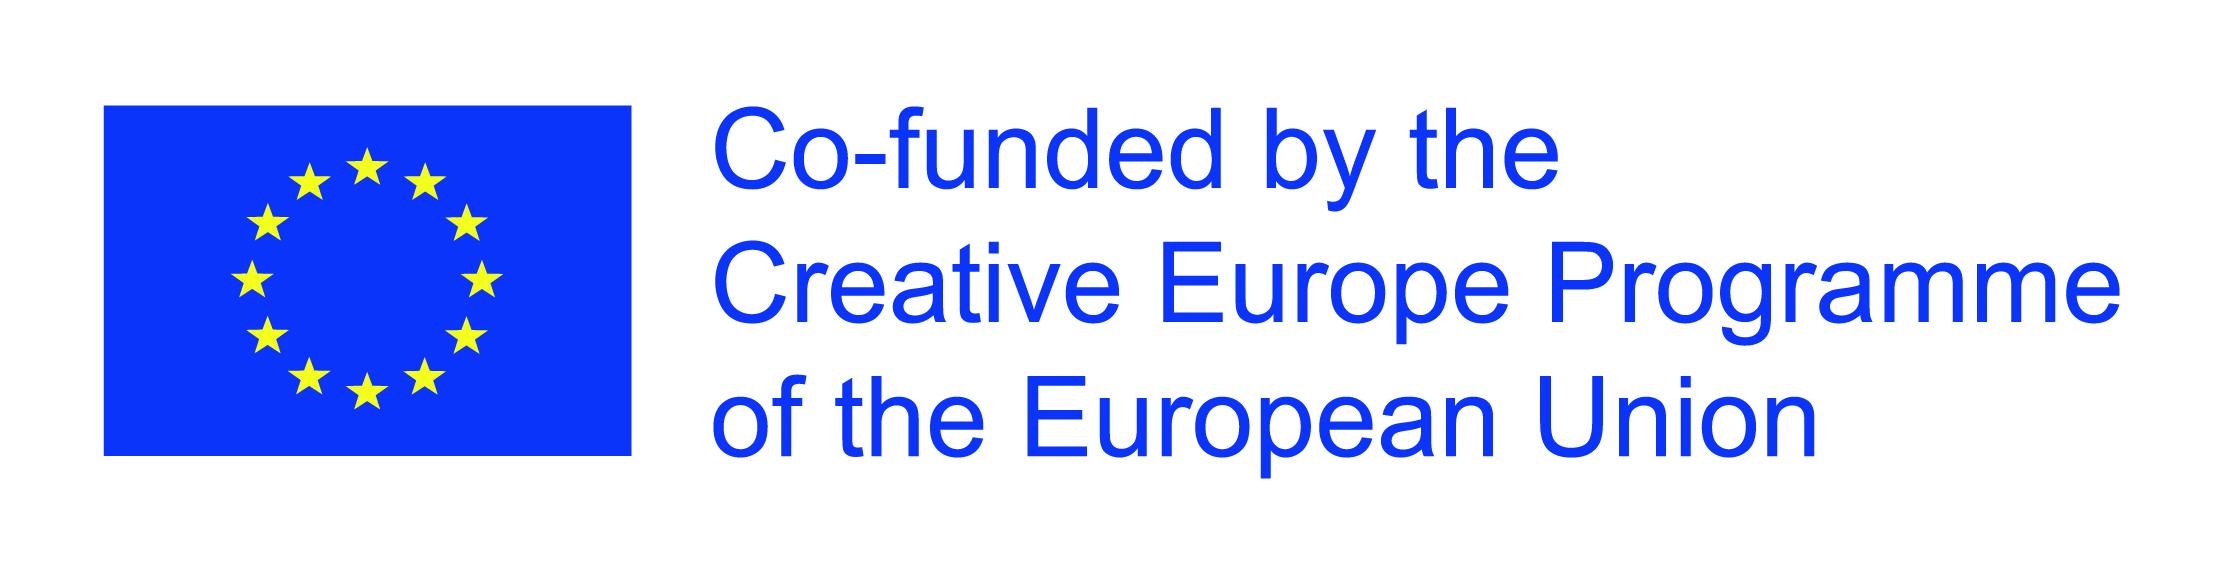 Programa Europa Criativa da UE